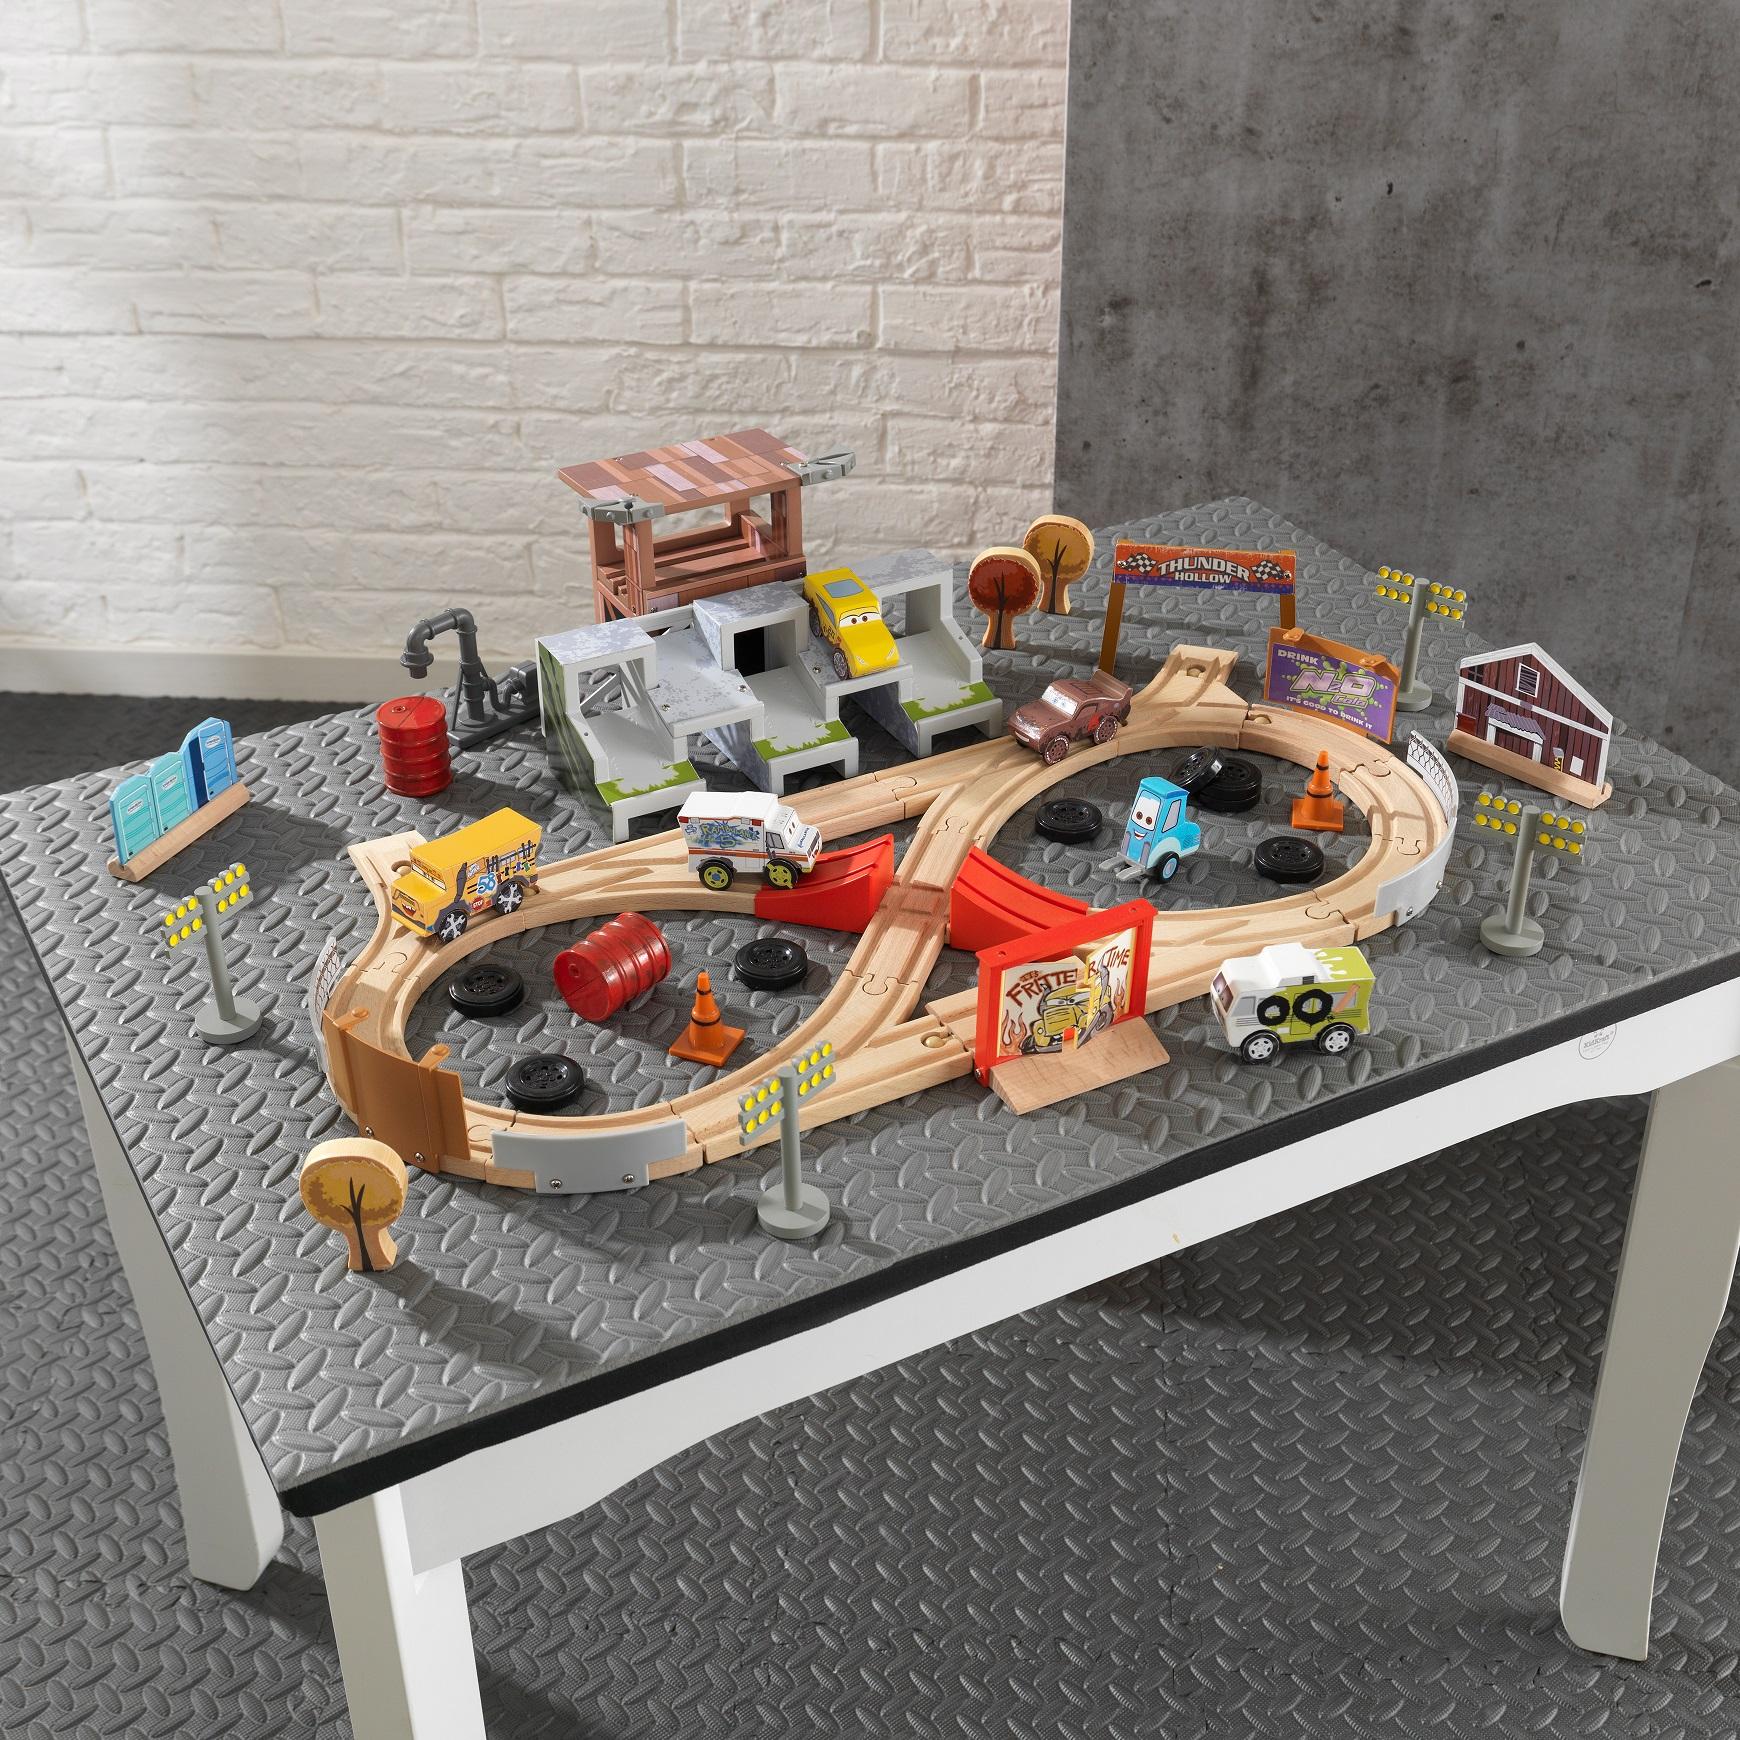 trenes de juguete trenes a pedales y electricos inforchess. Black Bedroom Furniture Sets. Home Design Ideas